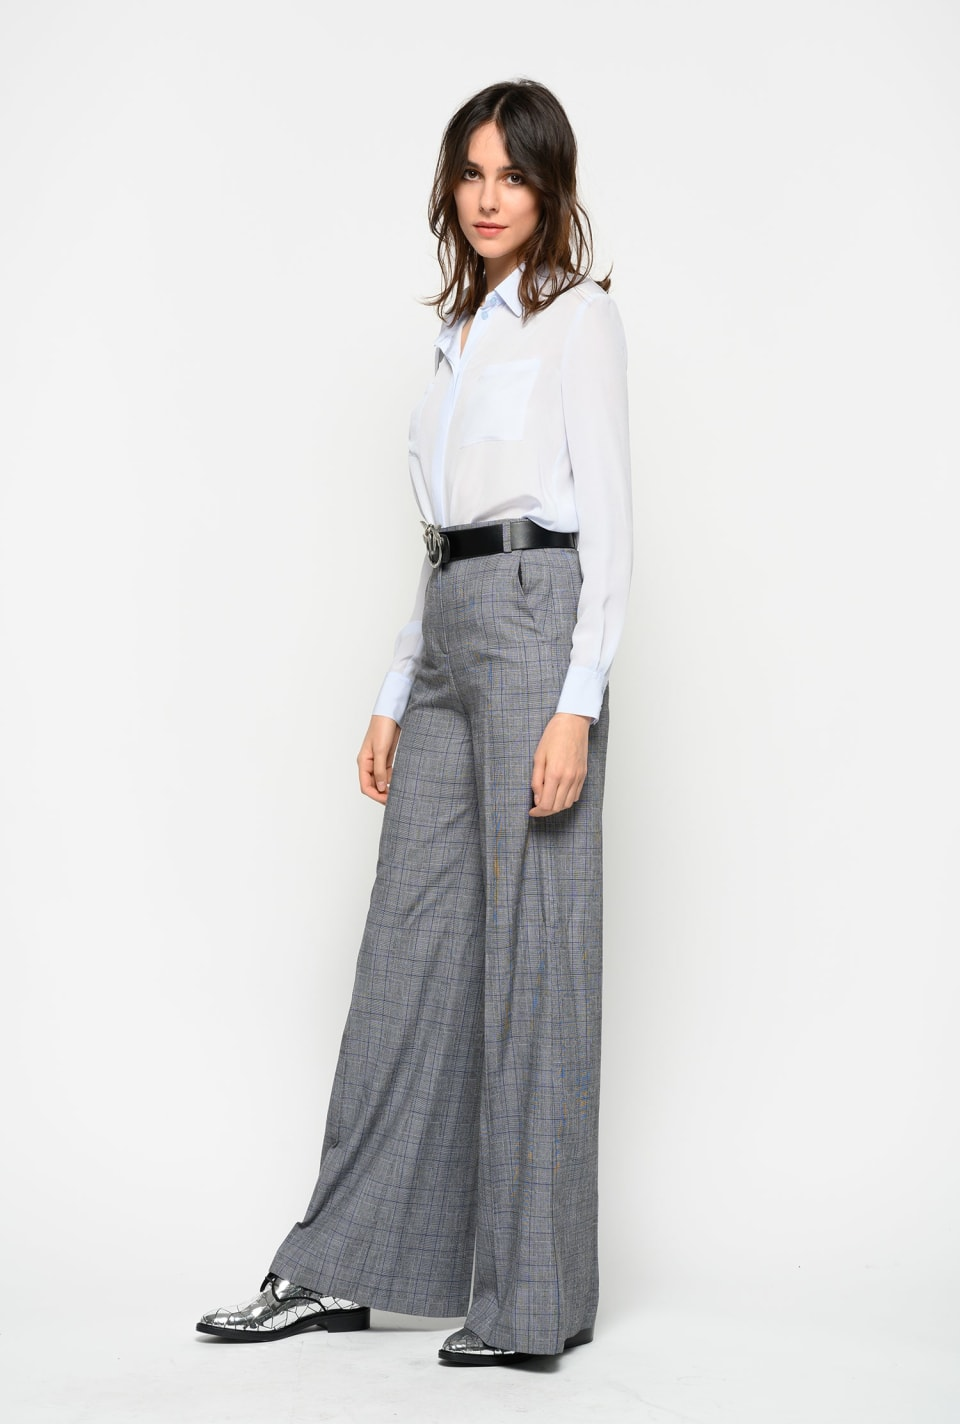 Woven wool palazzo trousers